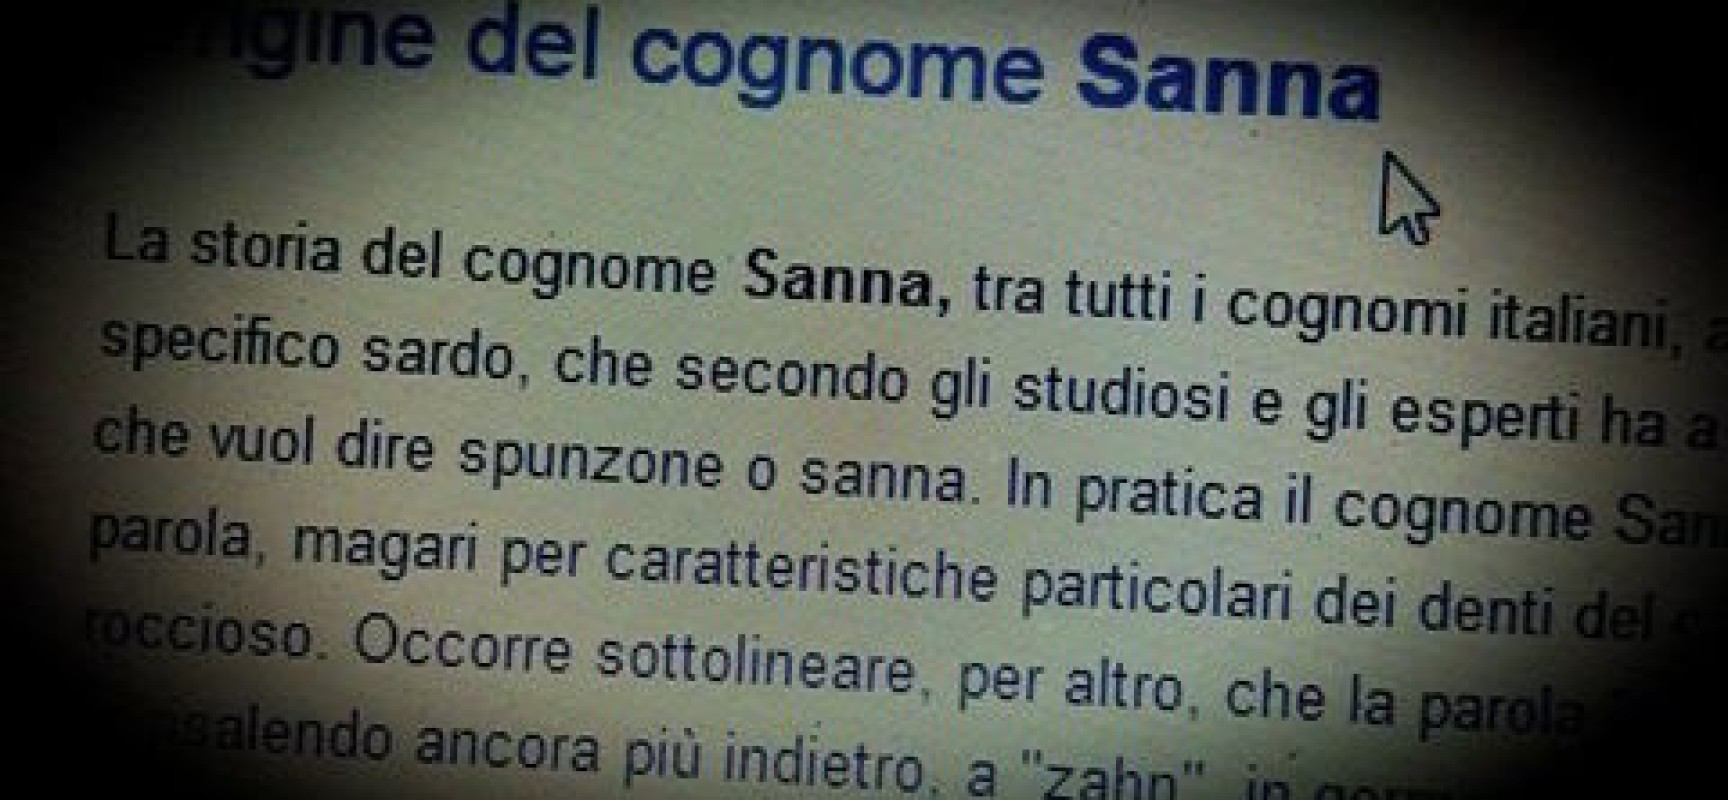 Tra Sanna, Sanna e Sanna…